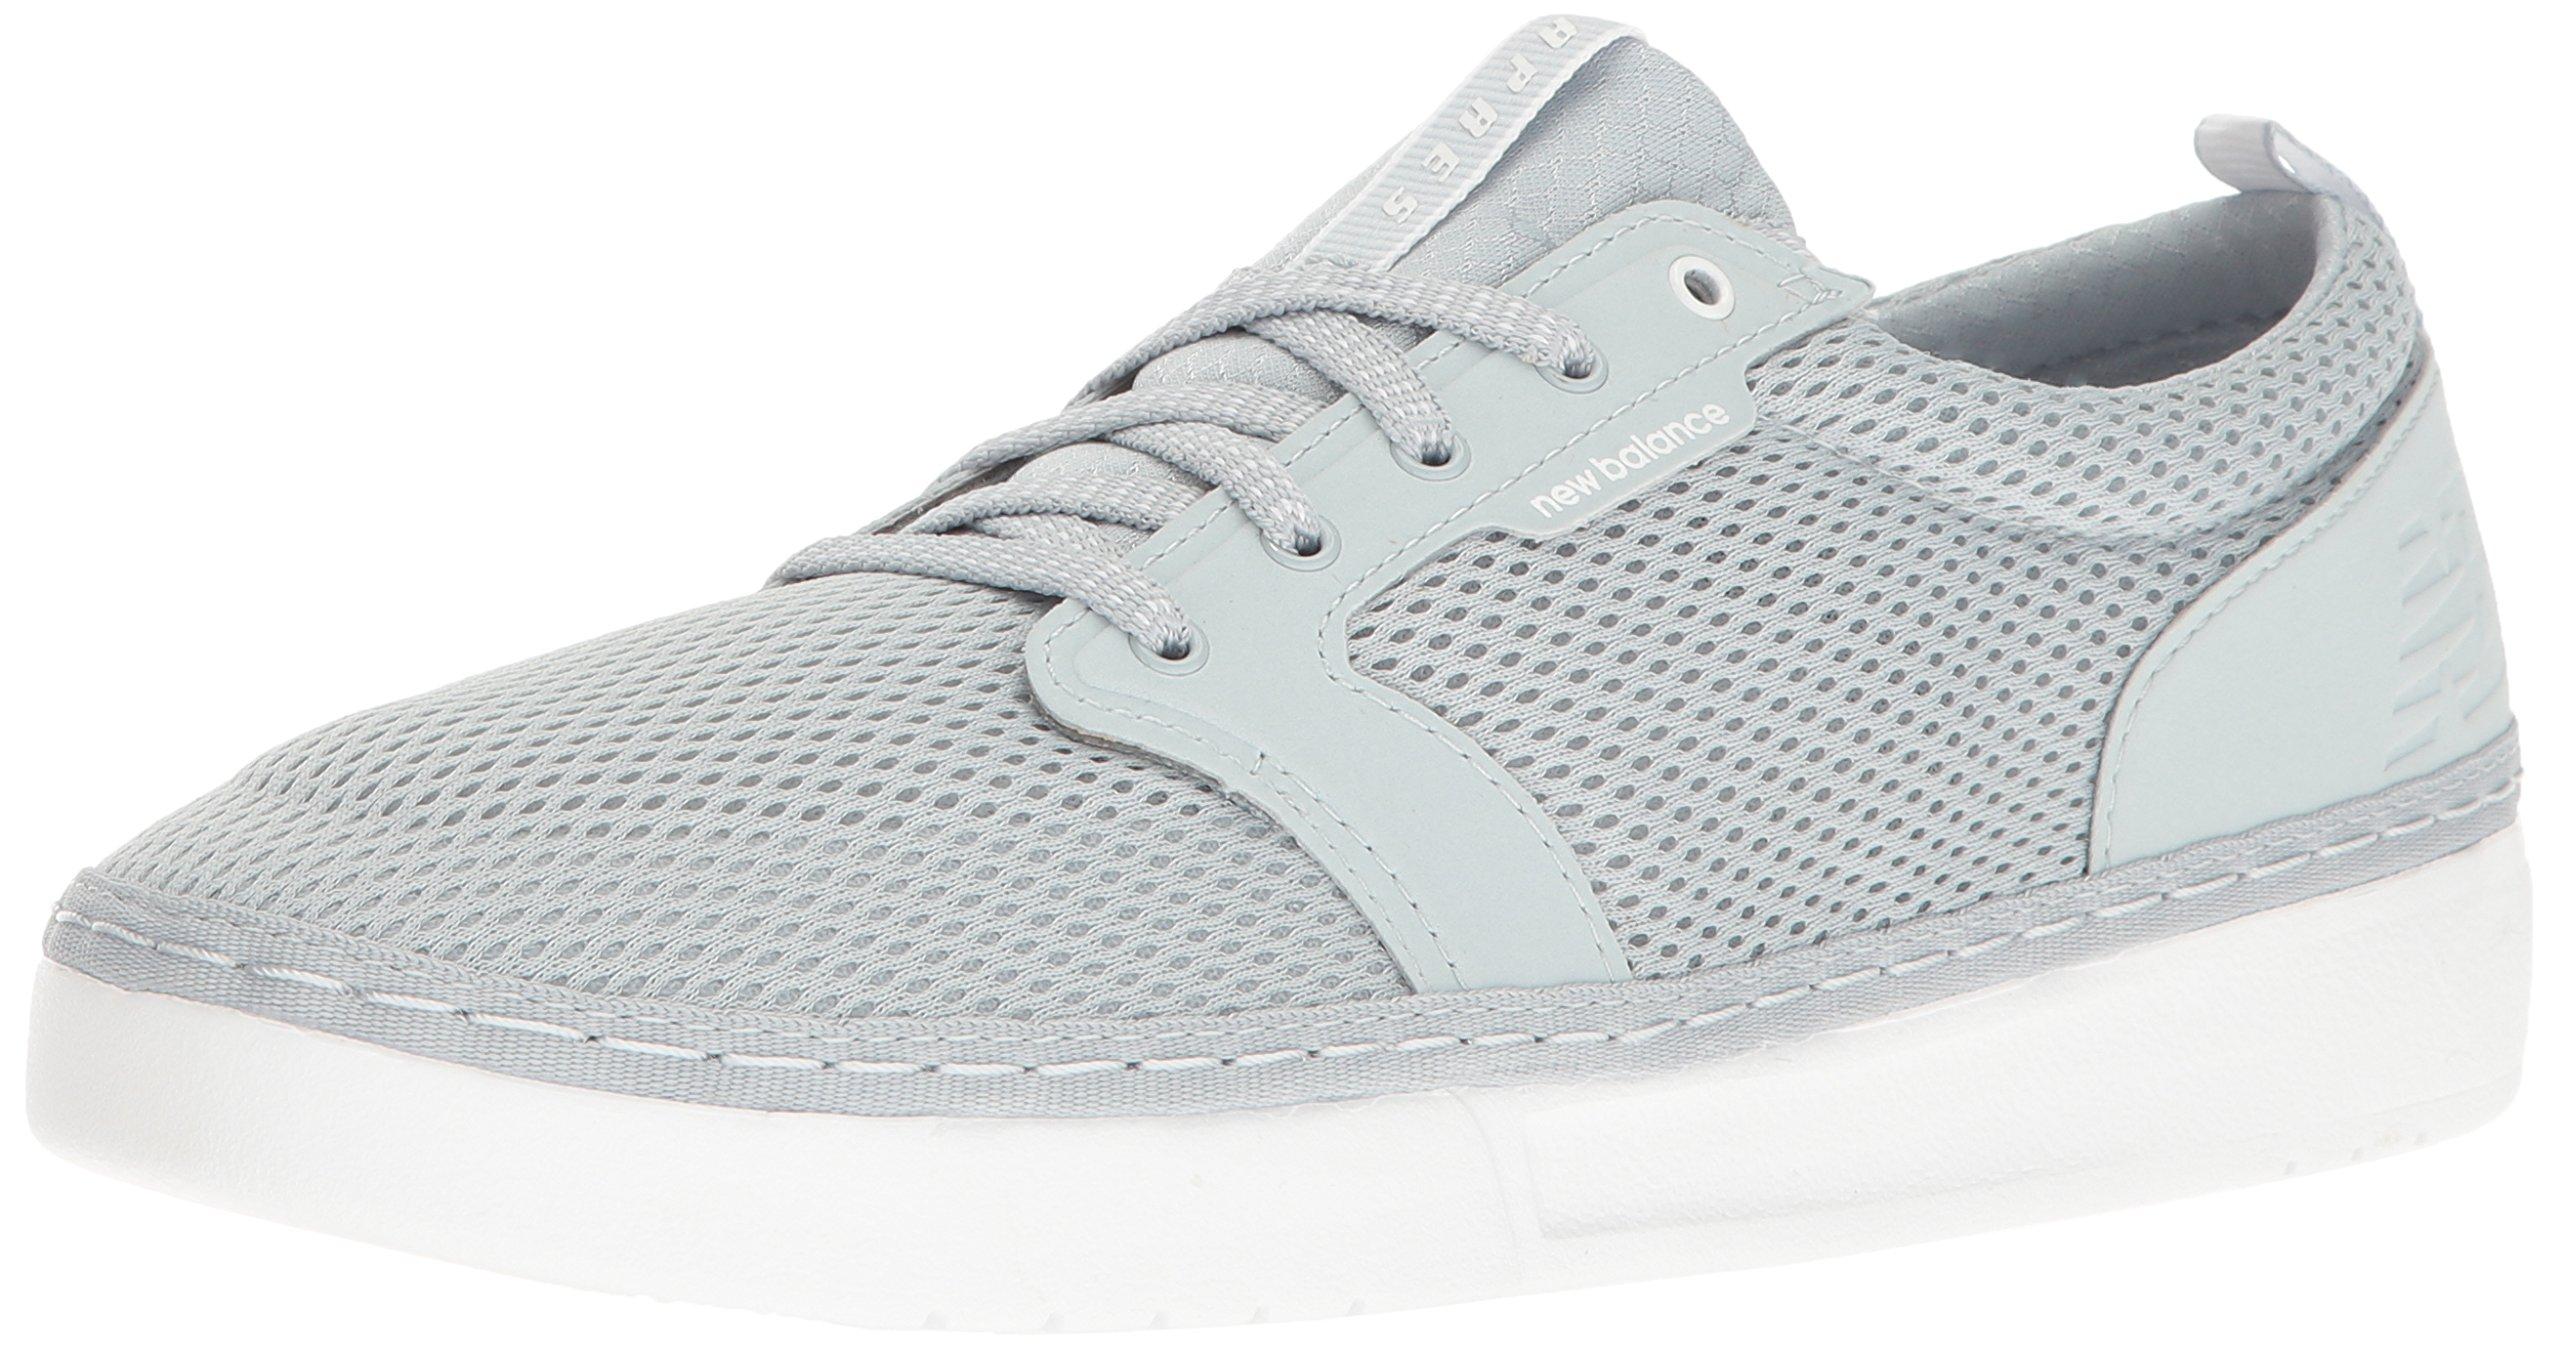 New Balance Men's Apres Lacrosse Shoe, Grey/White, 10 D US by New Balance